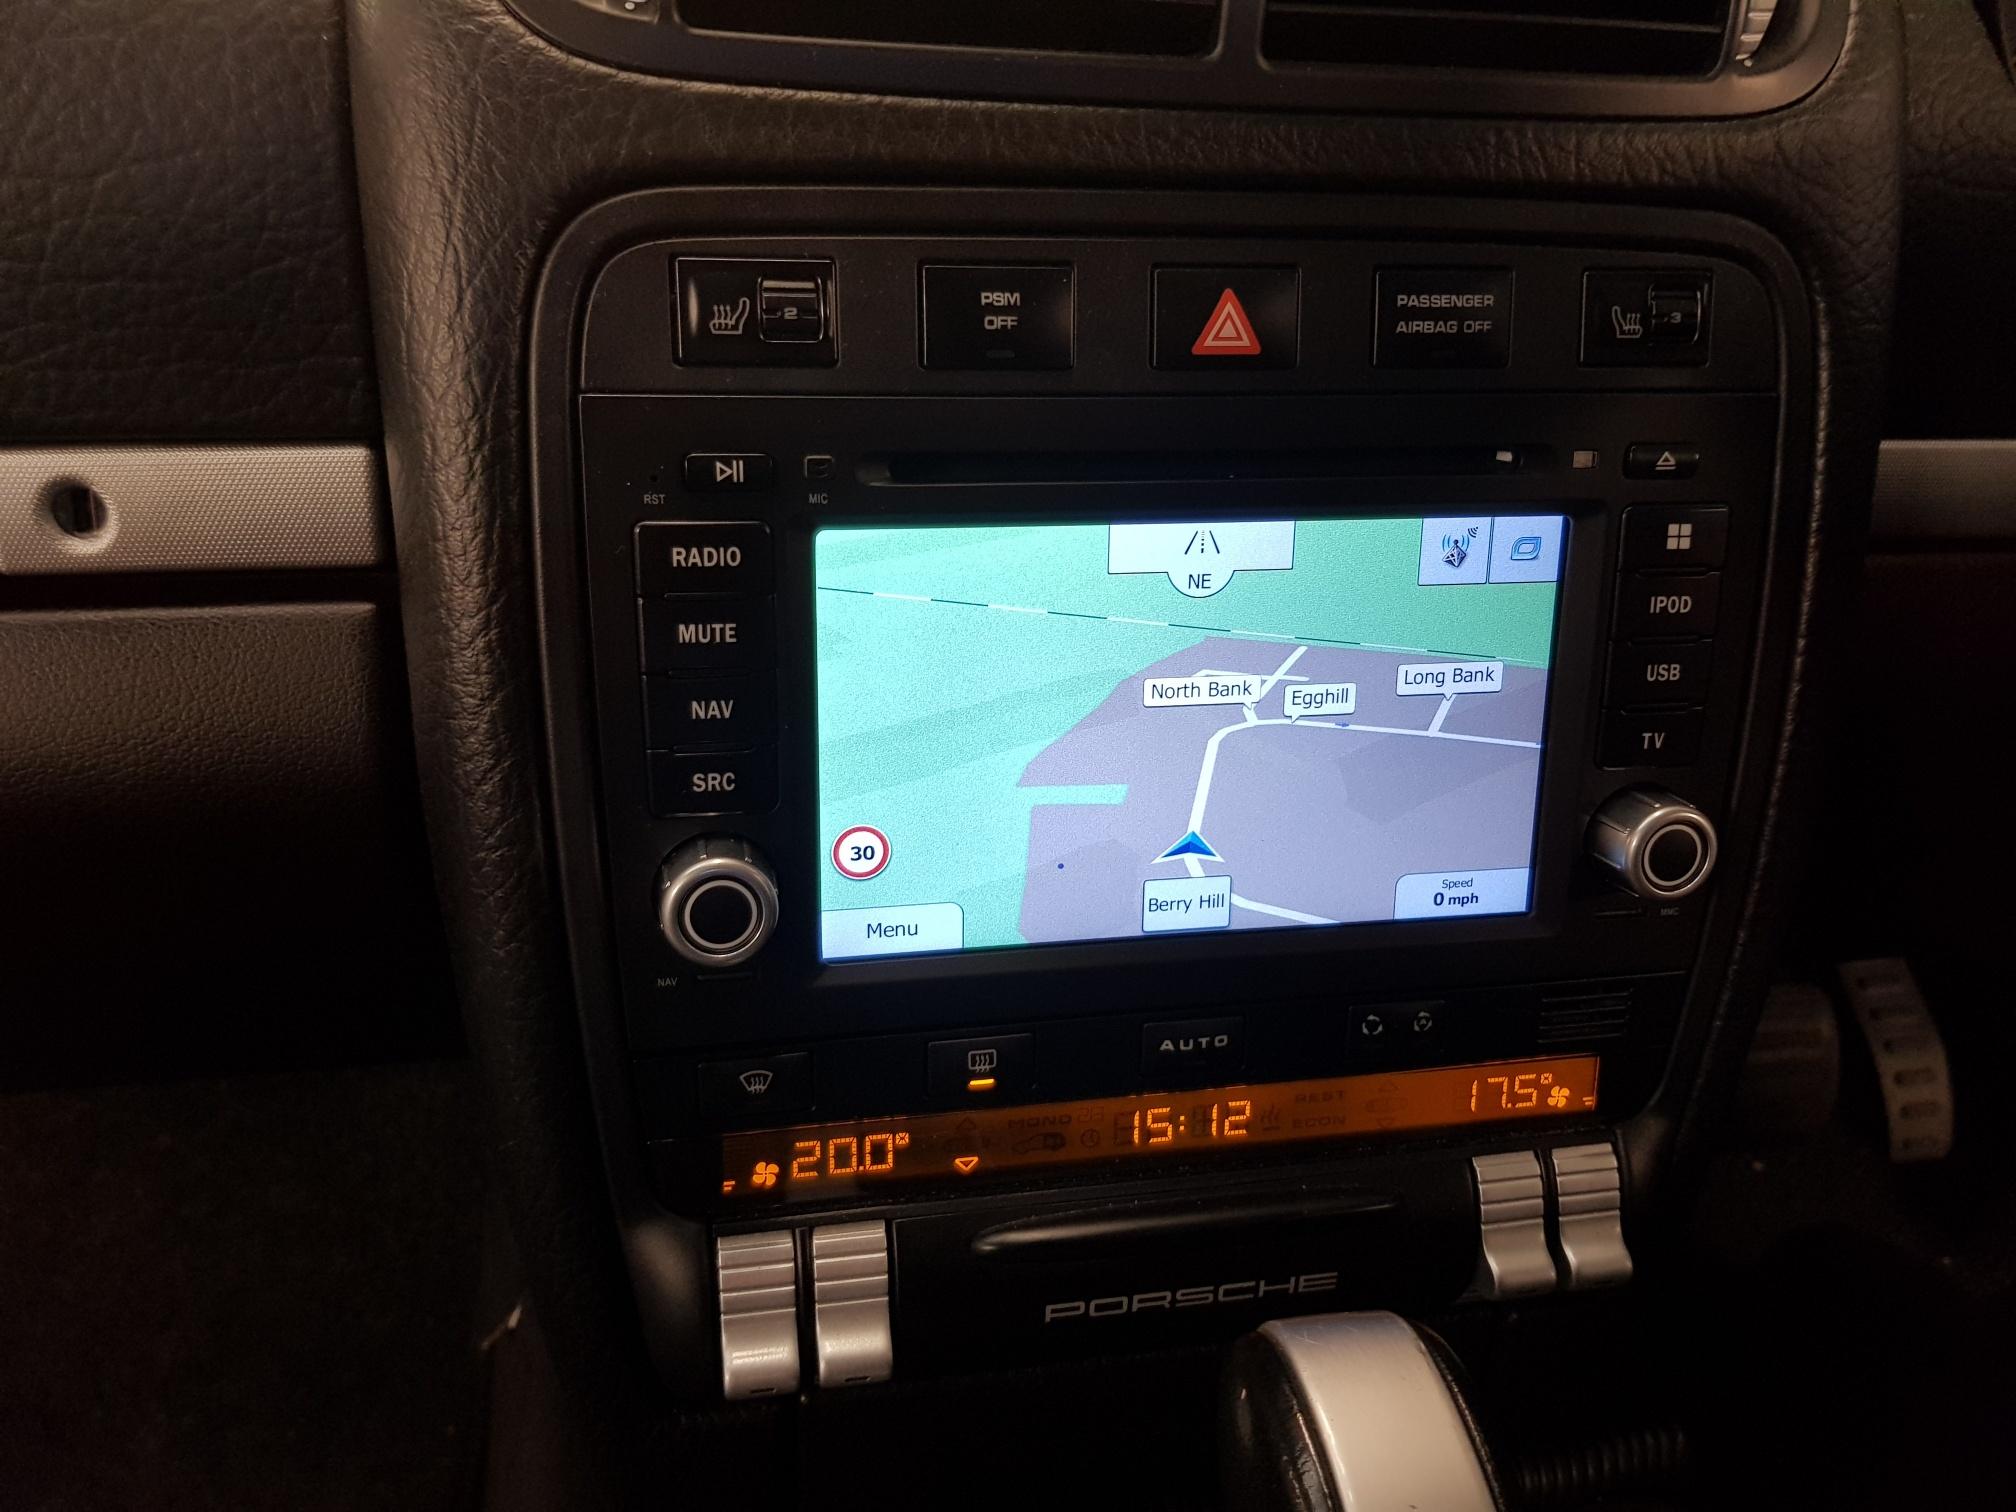 Dynavin N7-PC PRO Porsche Cayenne 2003-2010 - Apple CarPlay & Android Auto